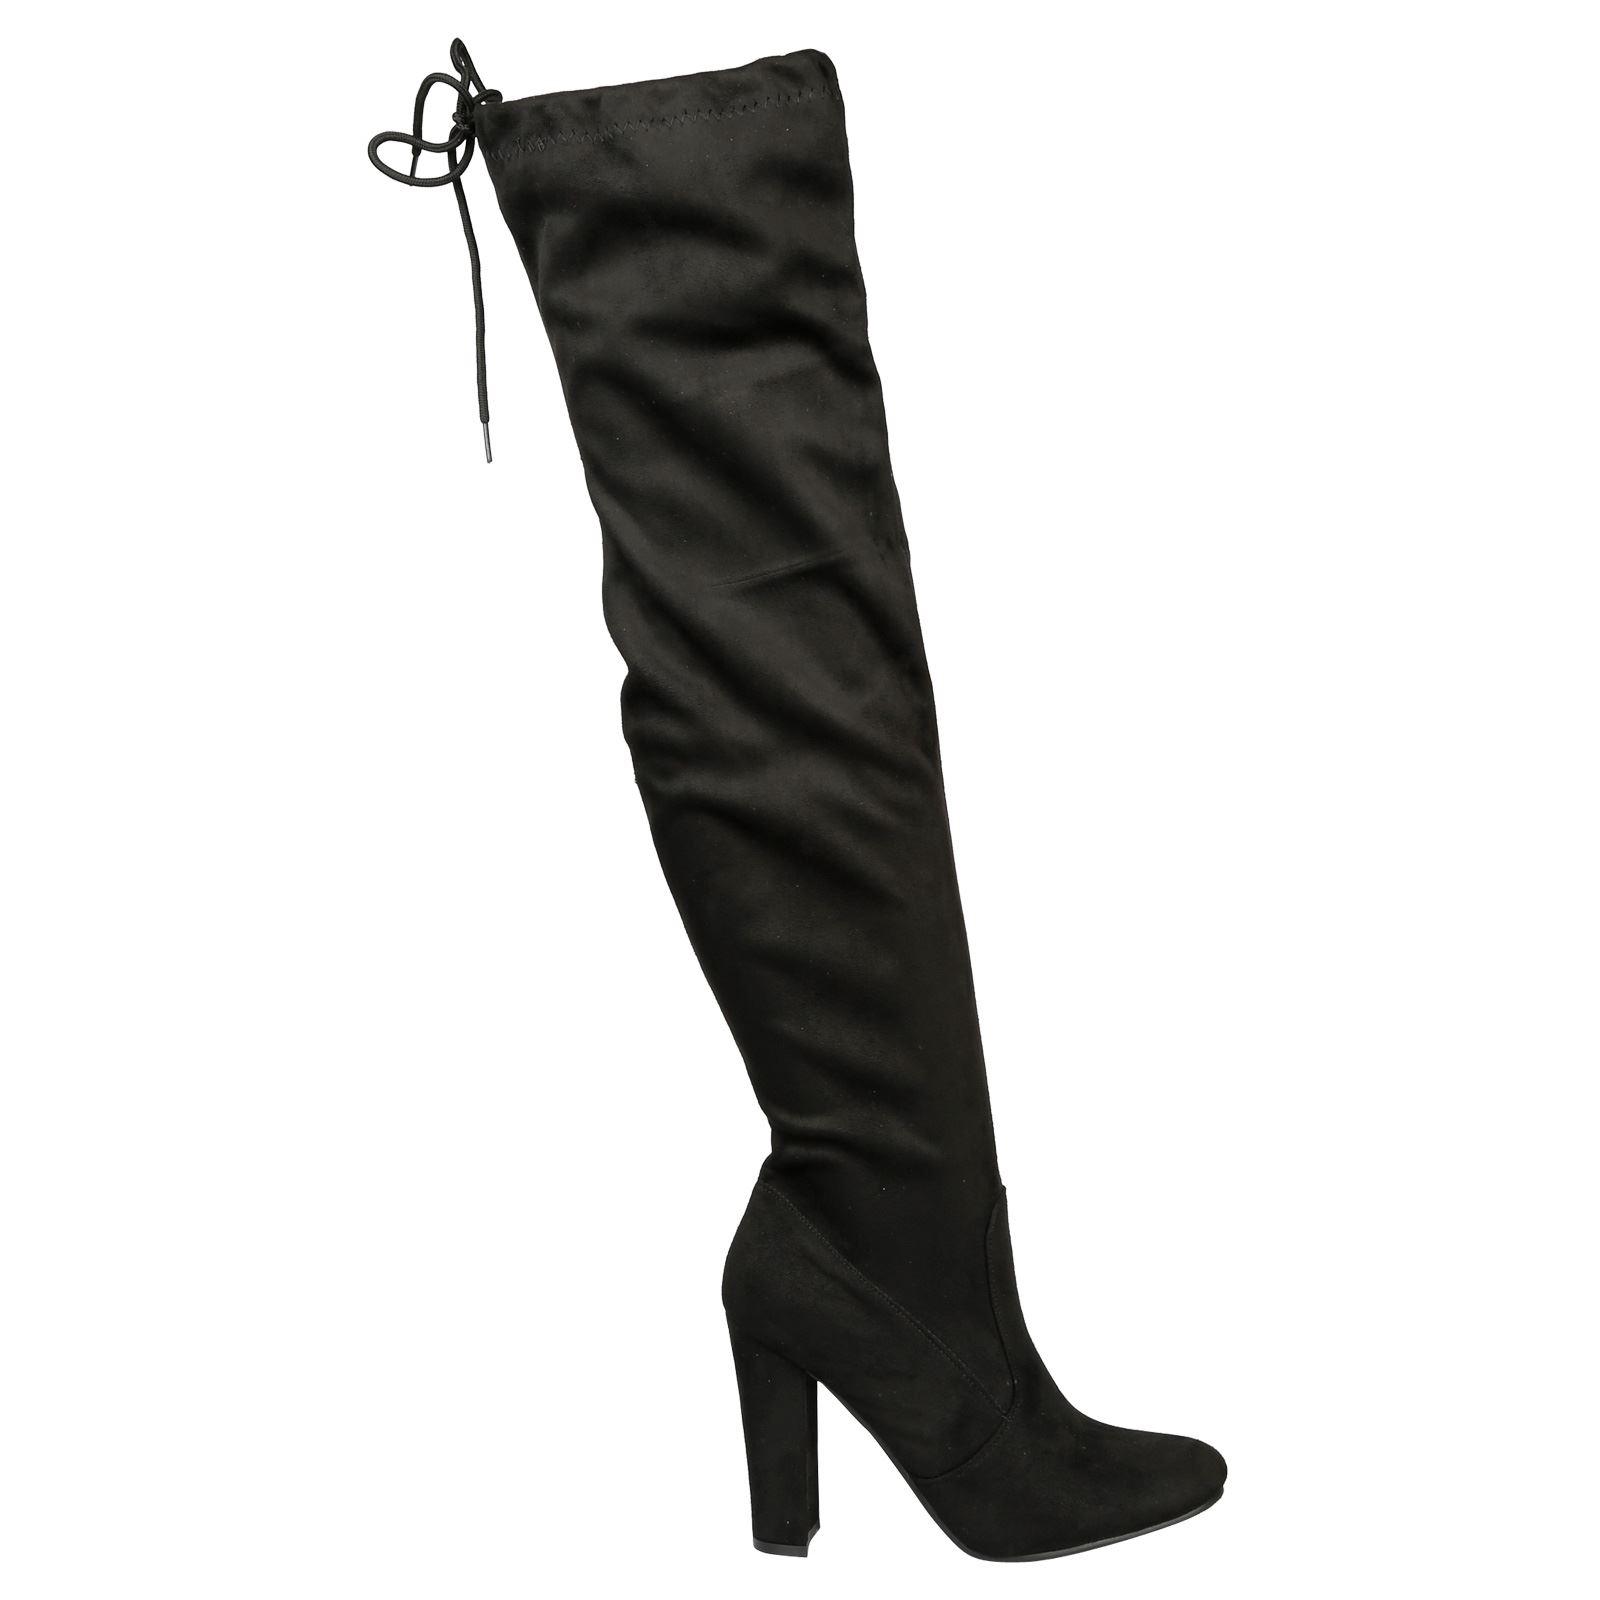 Iliana-Womens-Knee-High-Zip-Up-Adjustable-Pull-Strings-Mid-High-Block-Heel-Boots thumbnail 3